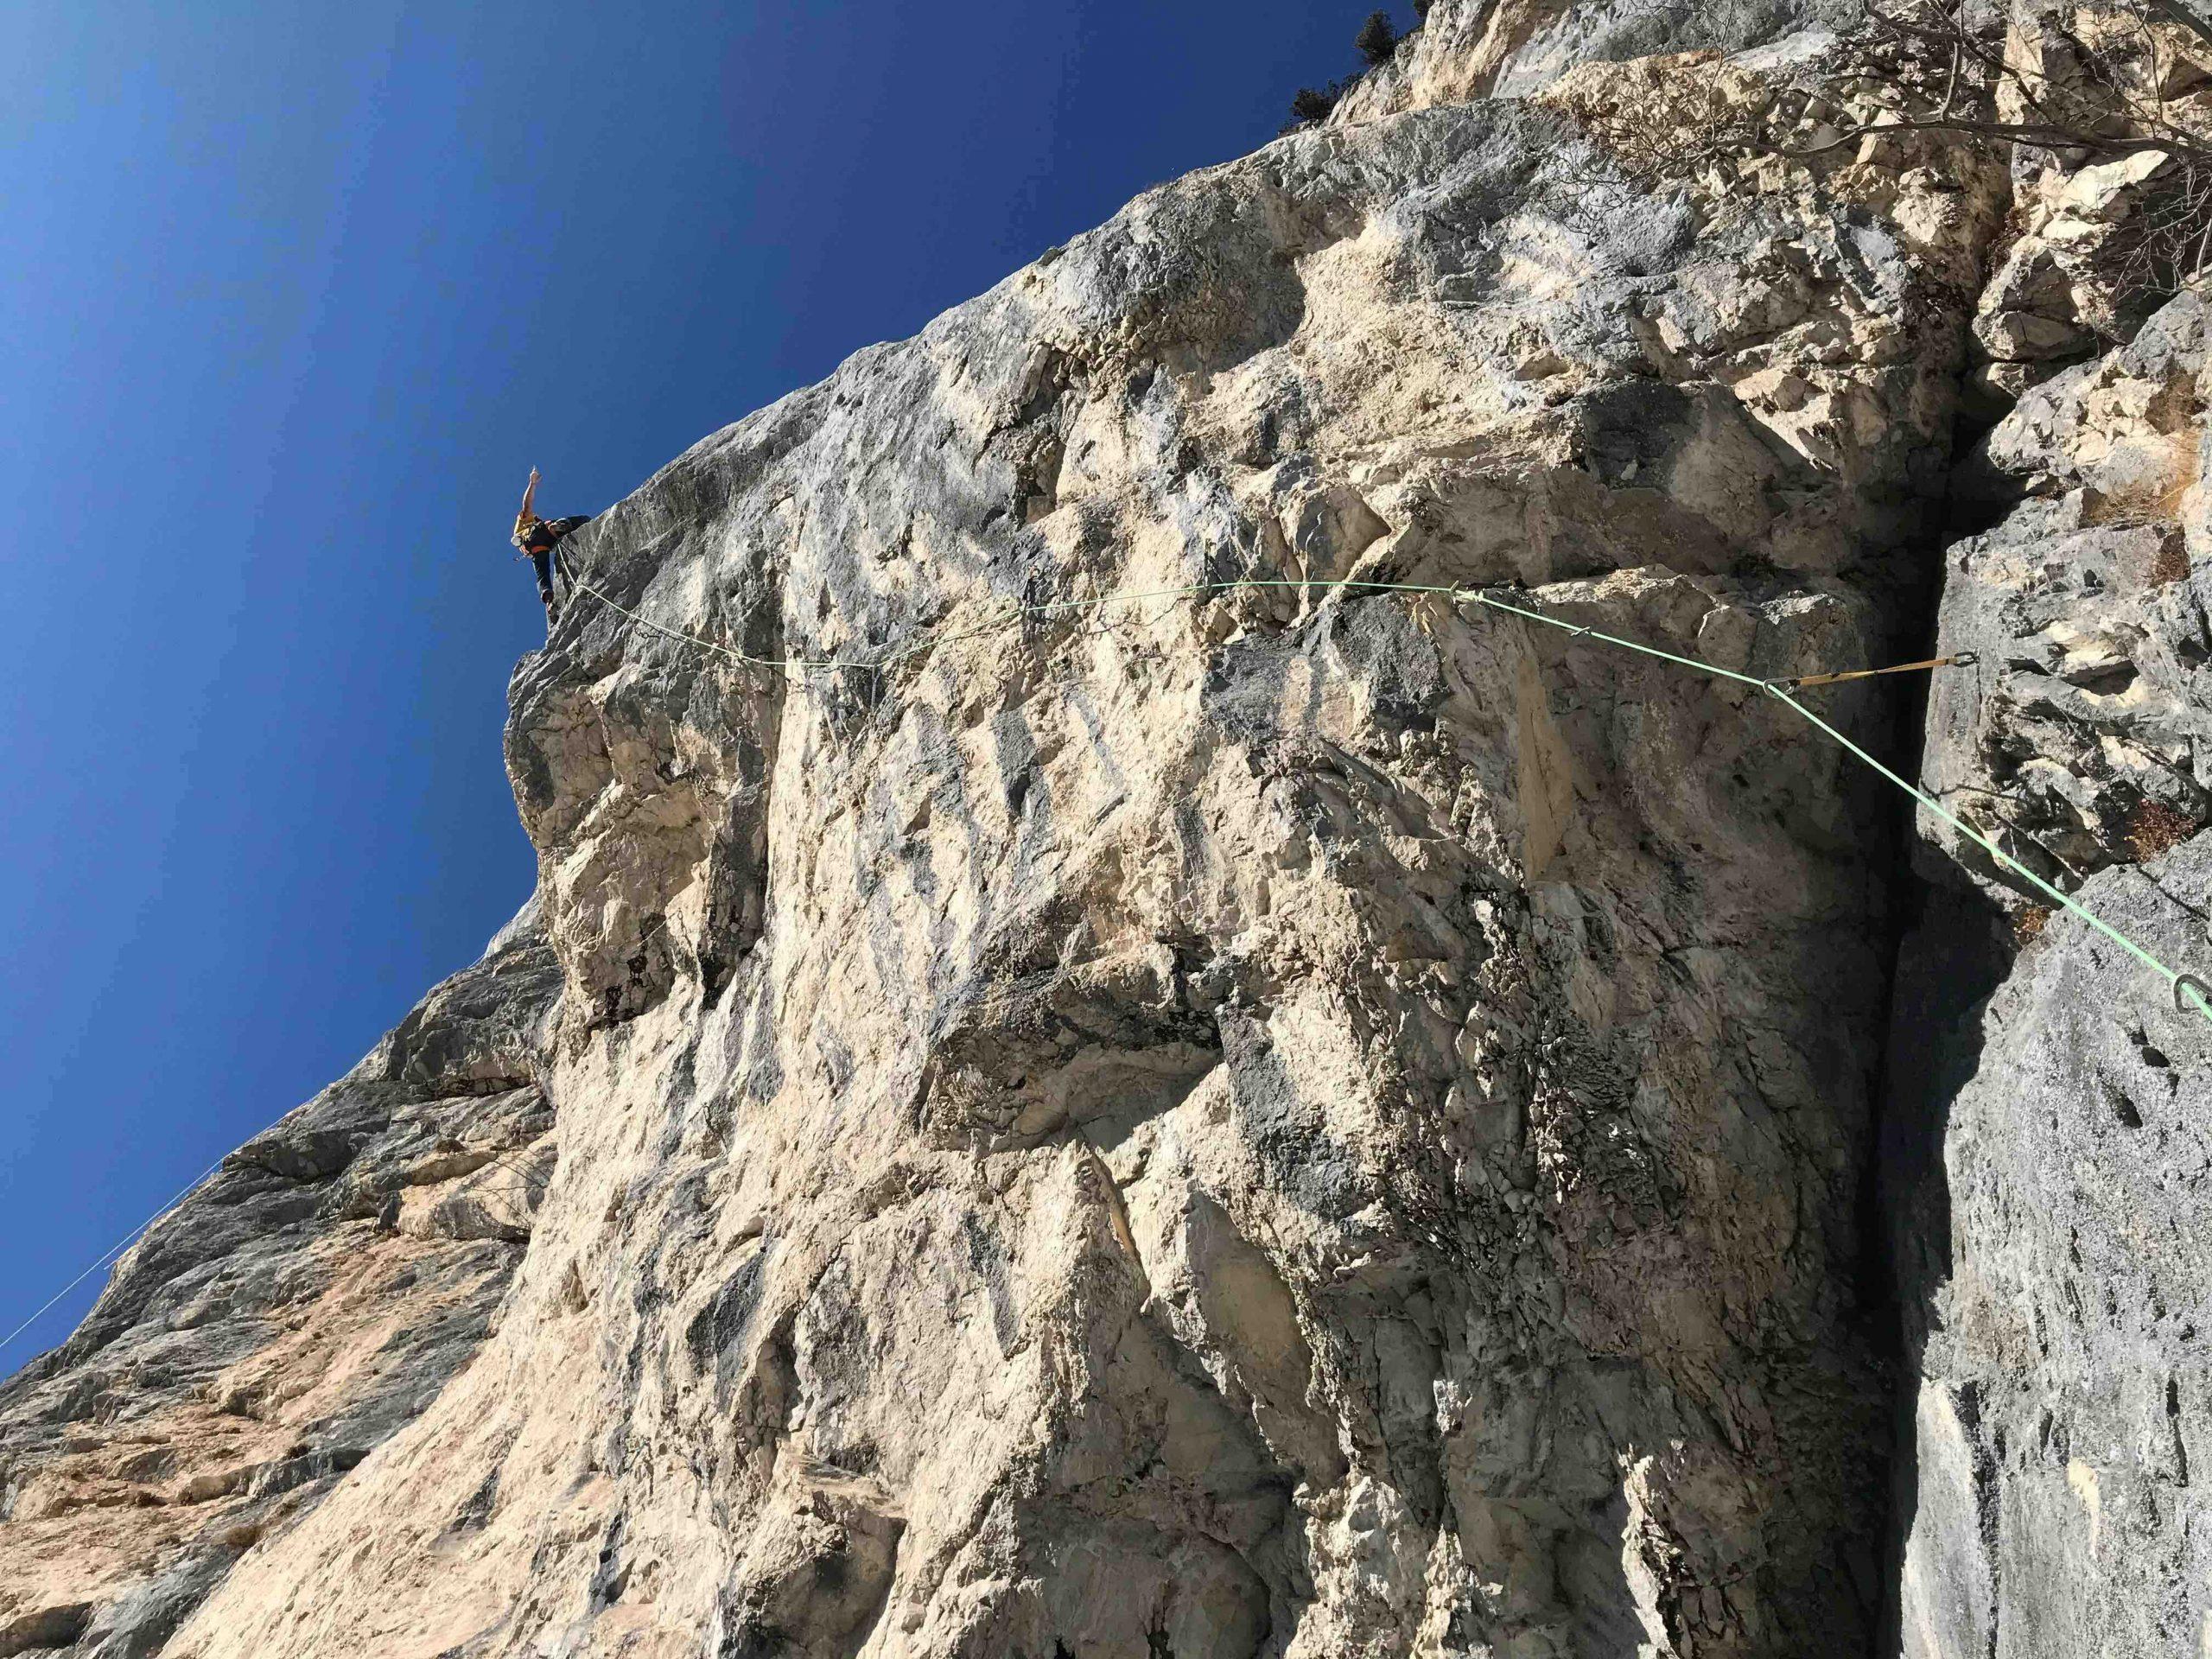 Wetterstein Chinesische Mauer, Foto: Thomas Wanner I Climbers Paradise